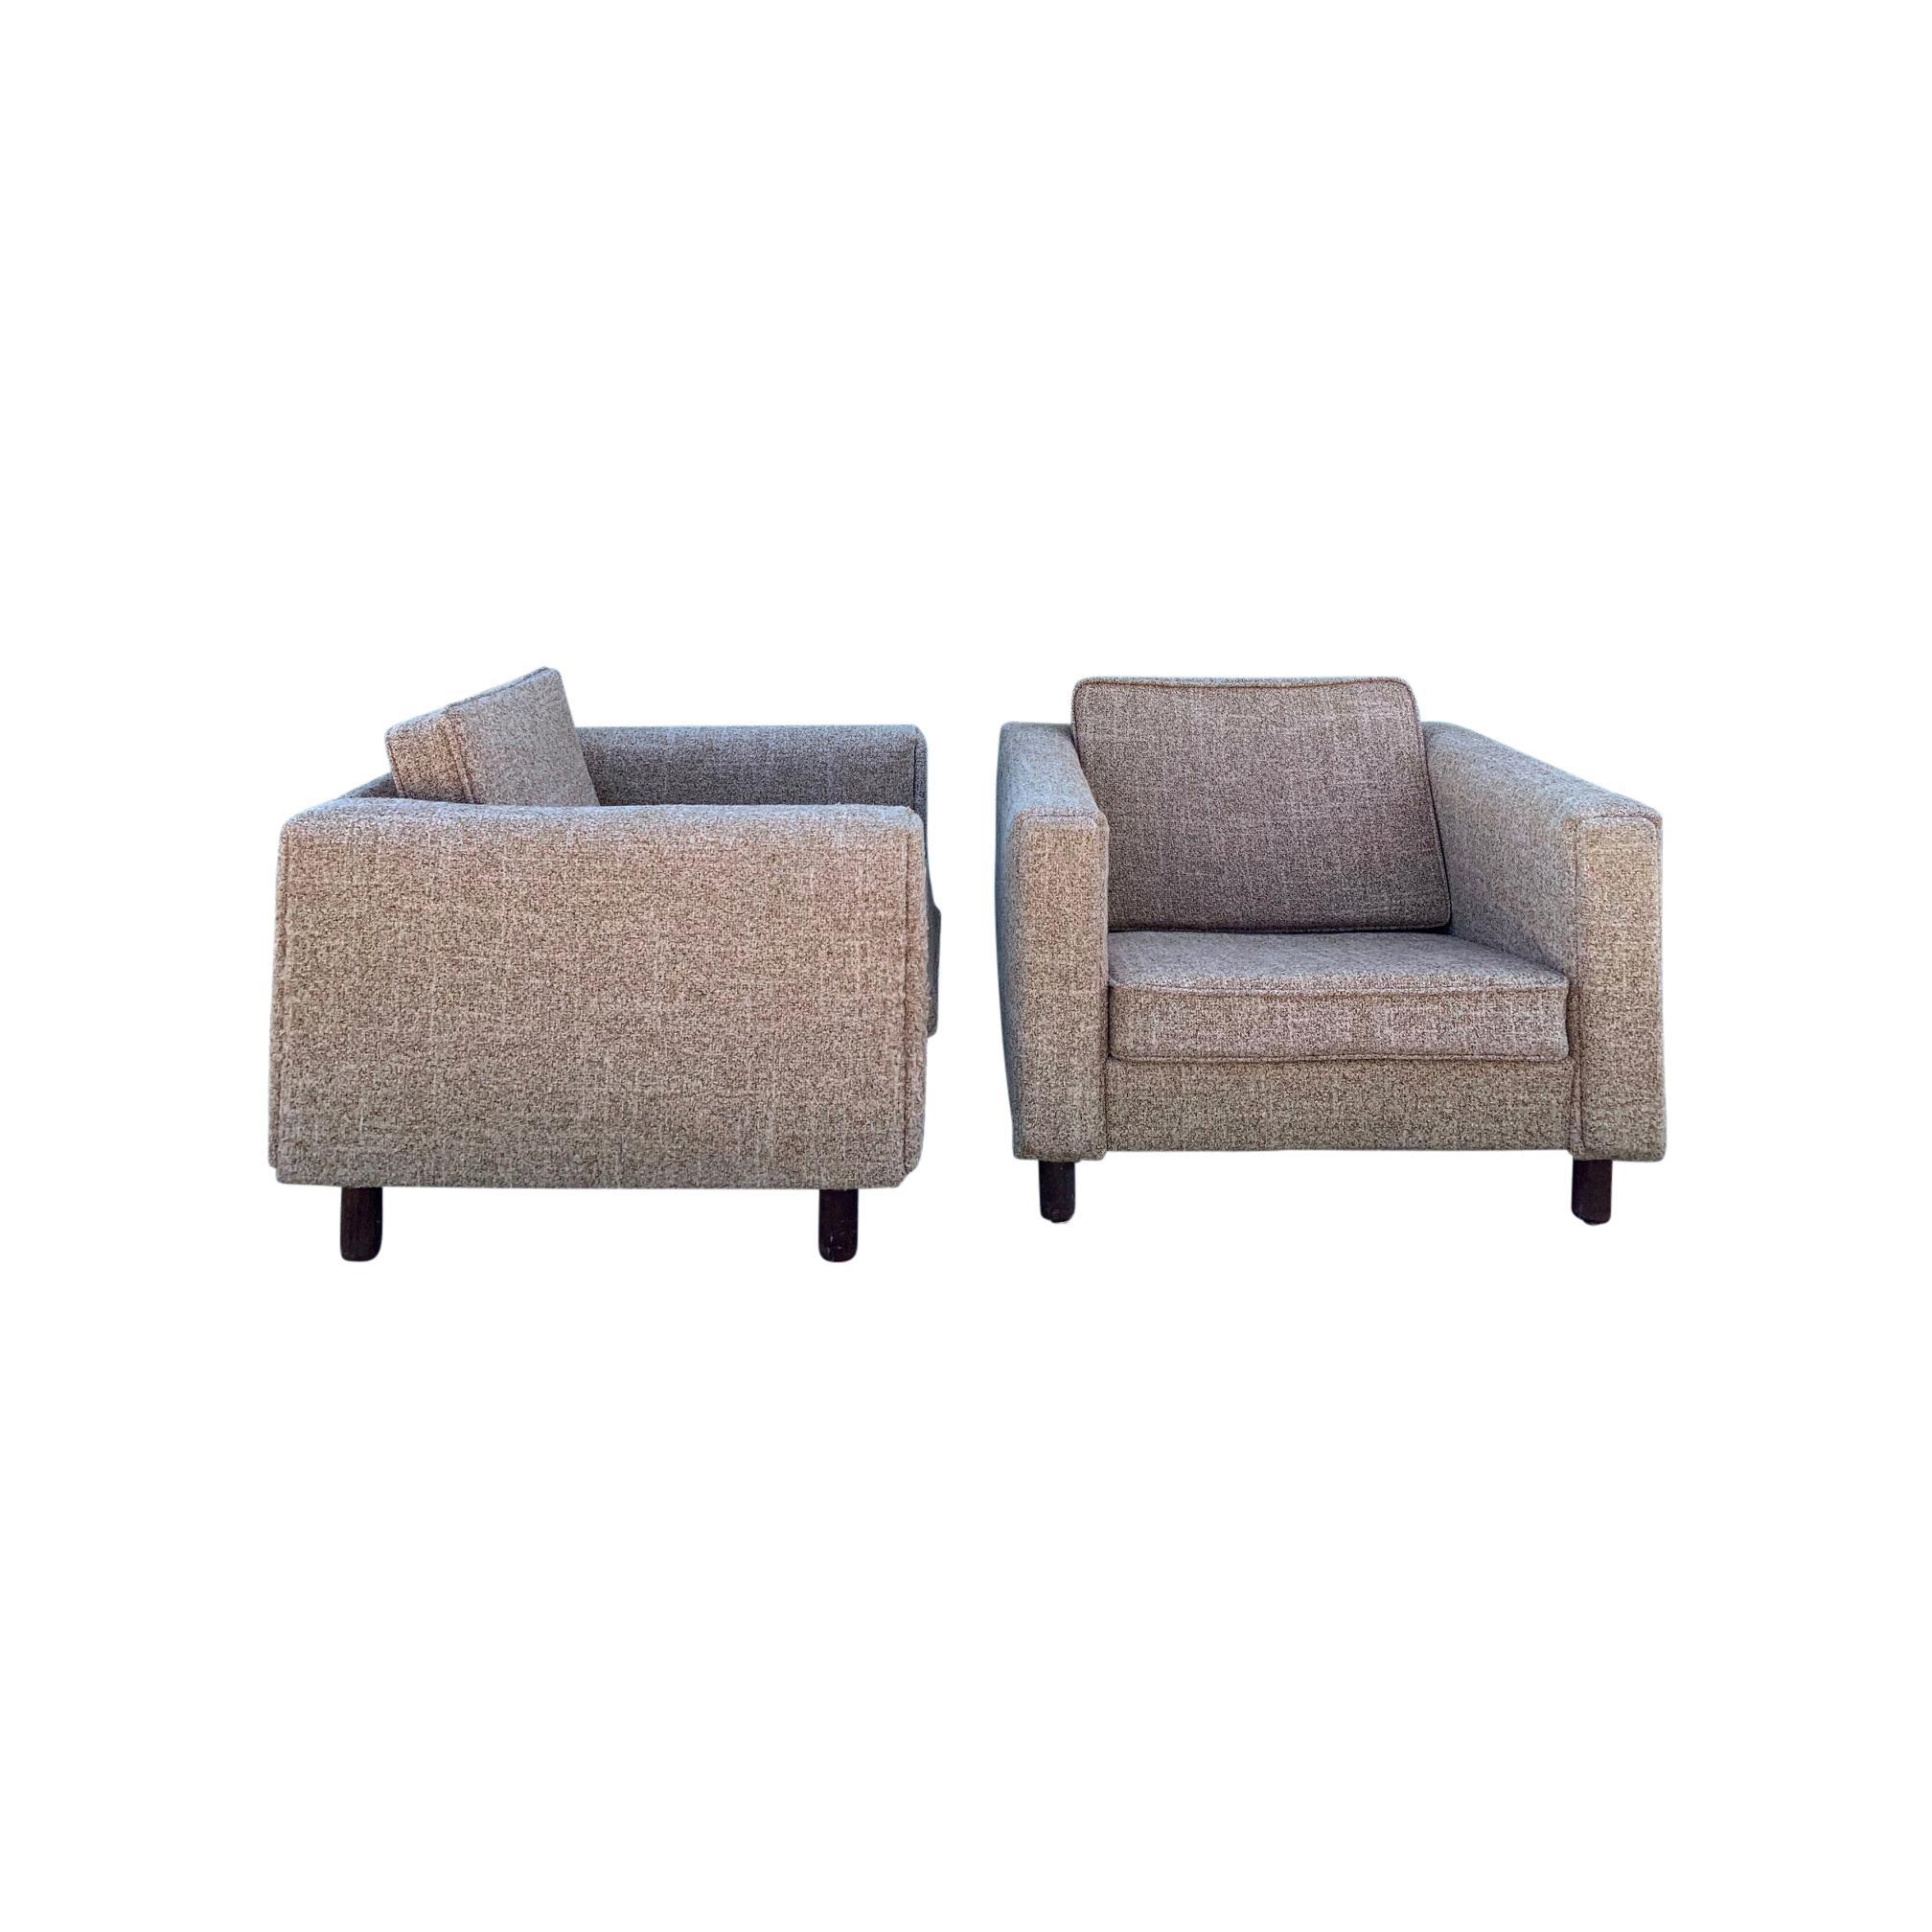 Pair of Hans Wegner Chairs GE 300 Easy Chairs for GETAMA